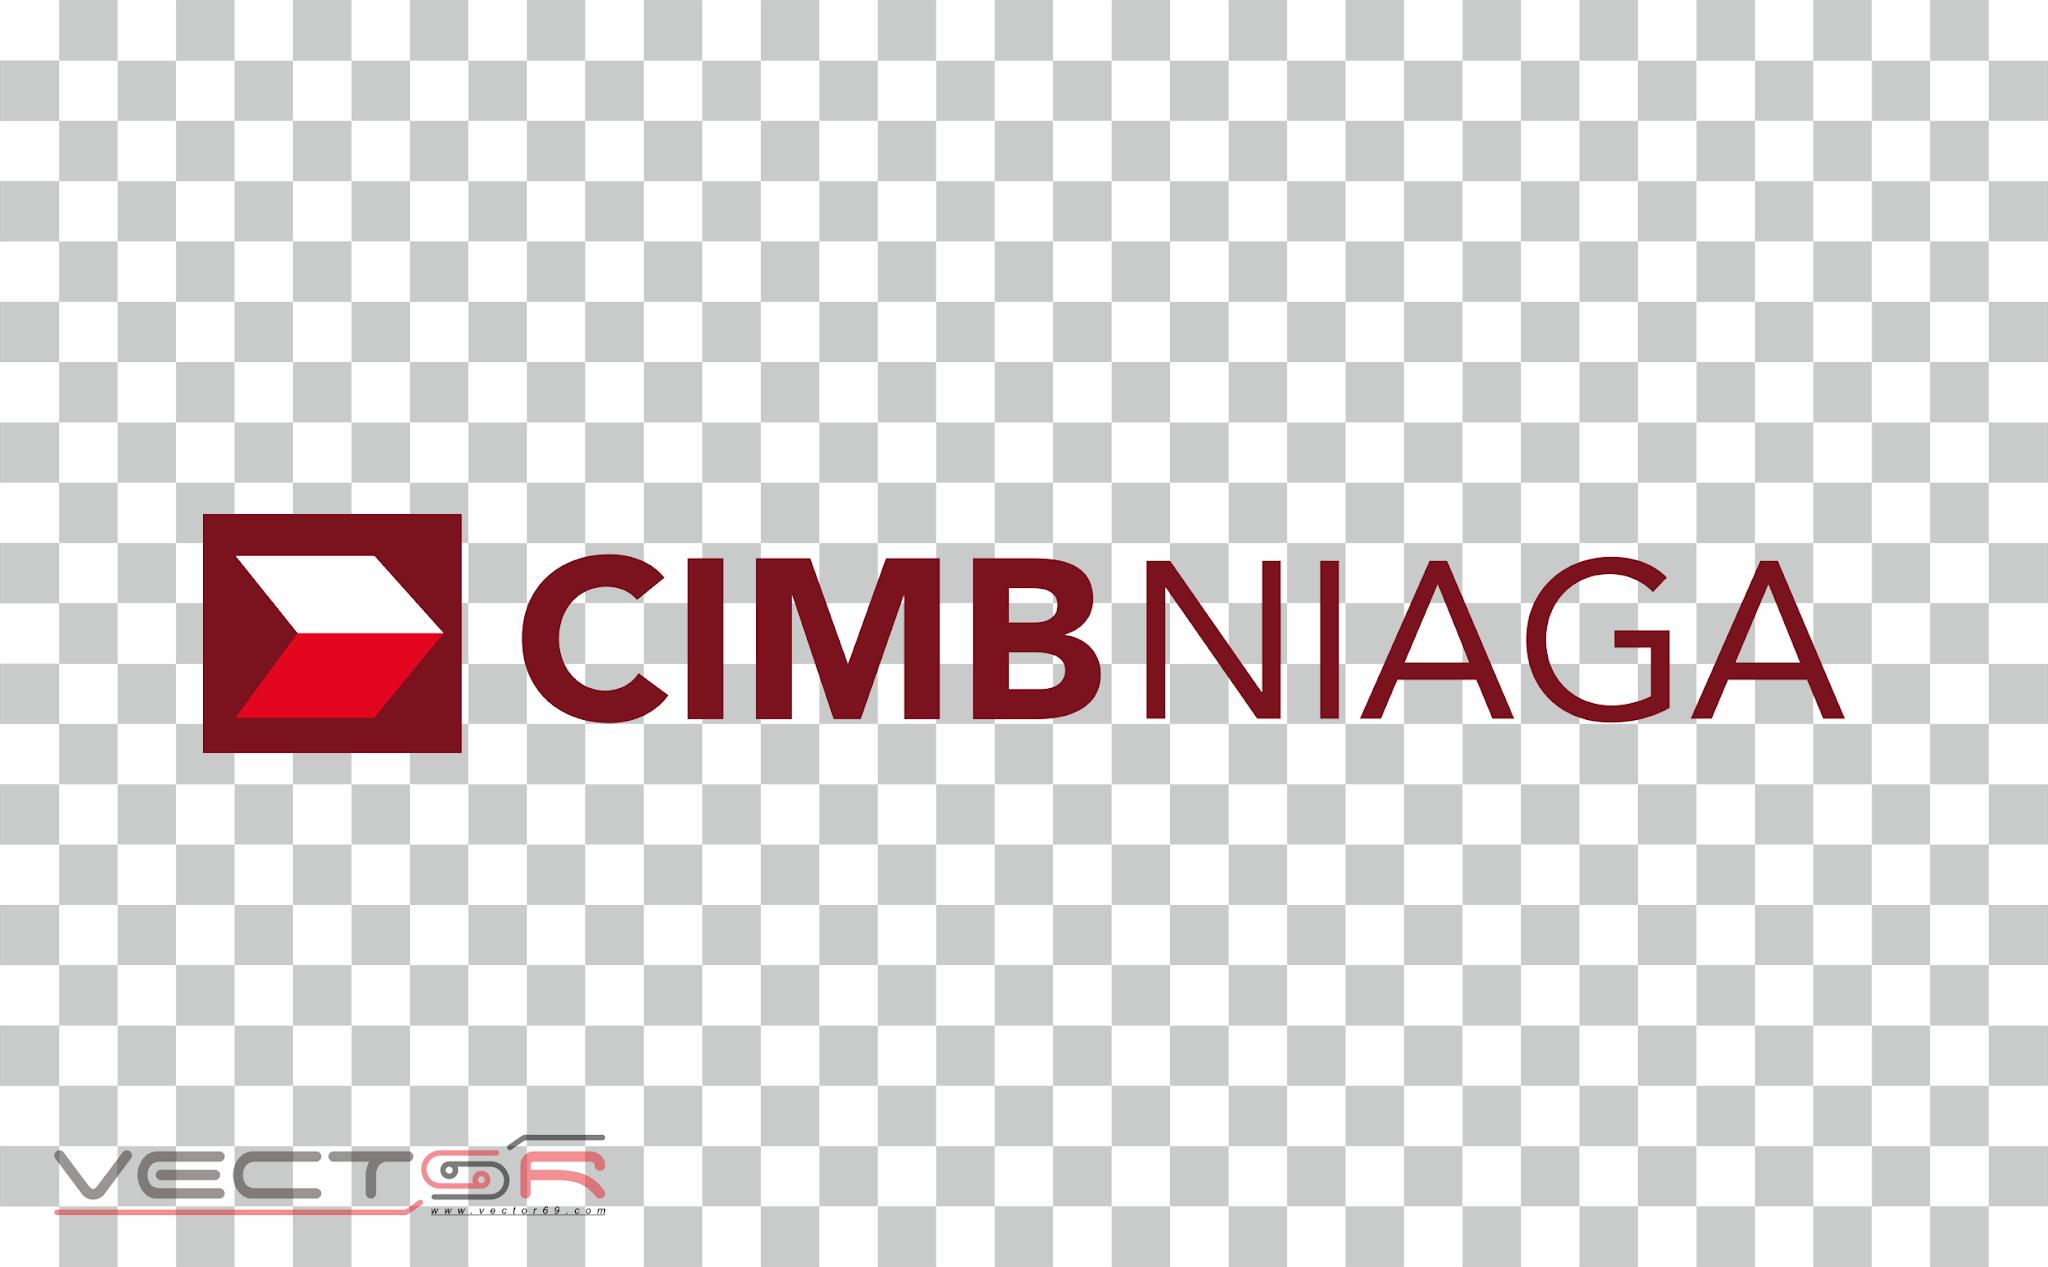 CIMB Niaga Logo - Download Vector File PNG (Portable Network Graphics)